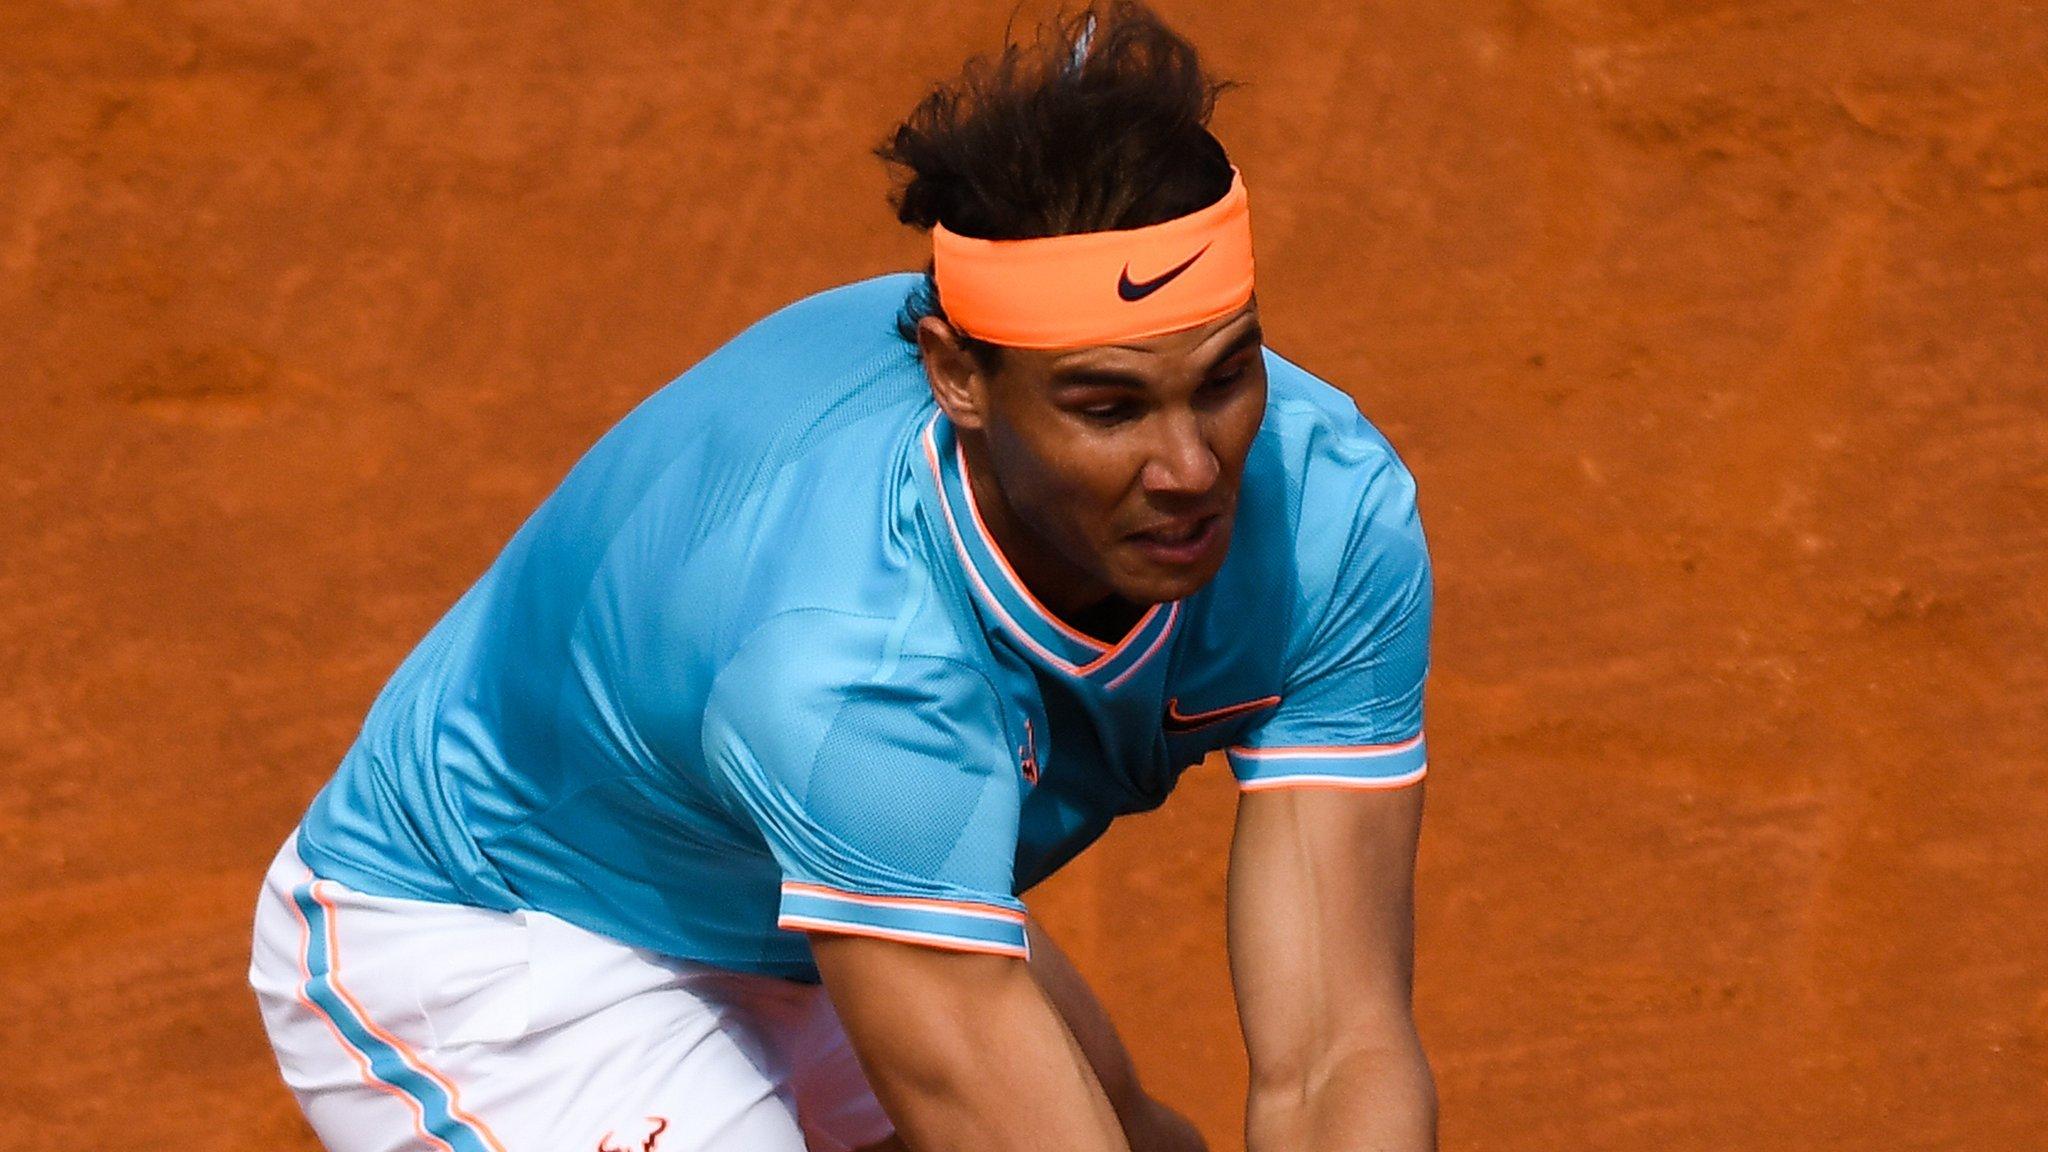 Barcelona Open: Rafael Nadal battles from set down to reach last 16